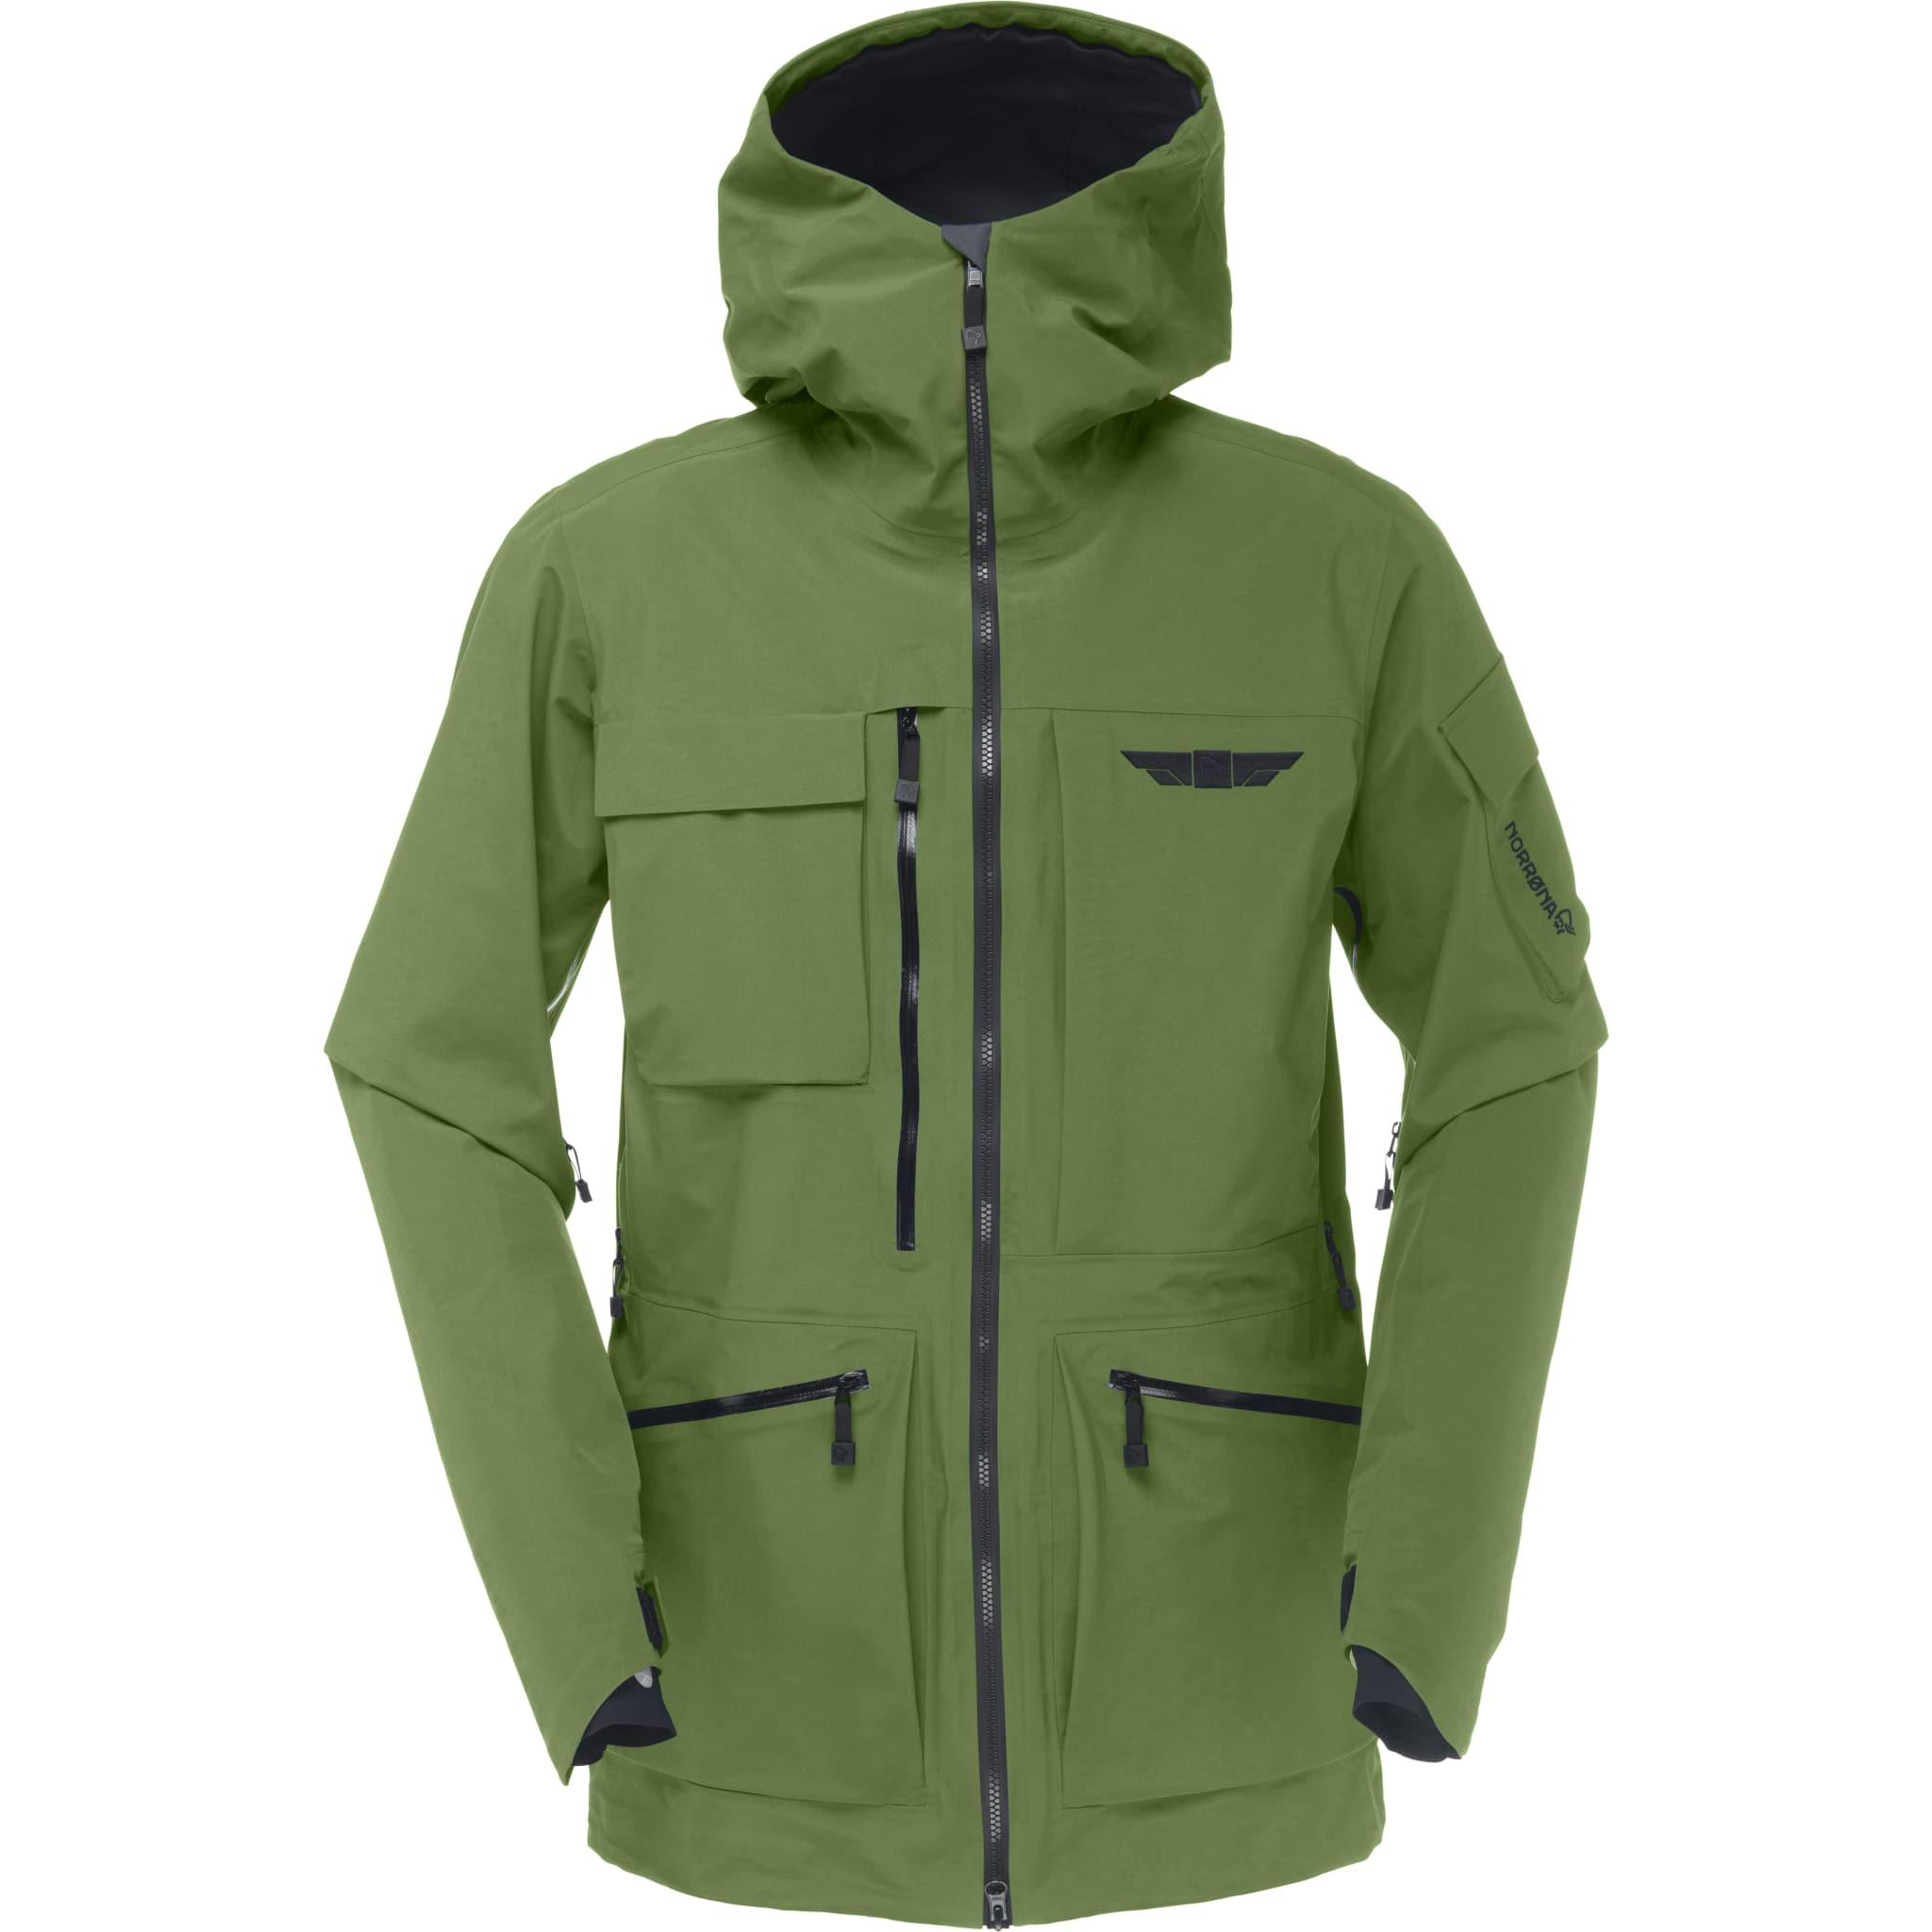 Tamok Gore-Tex Jacket